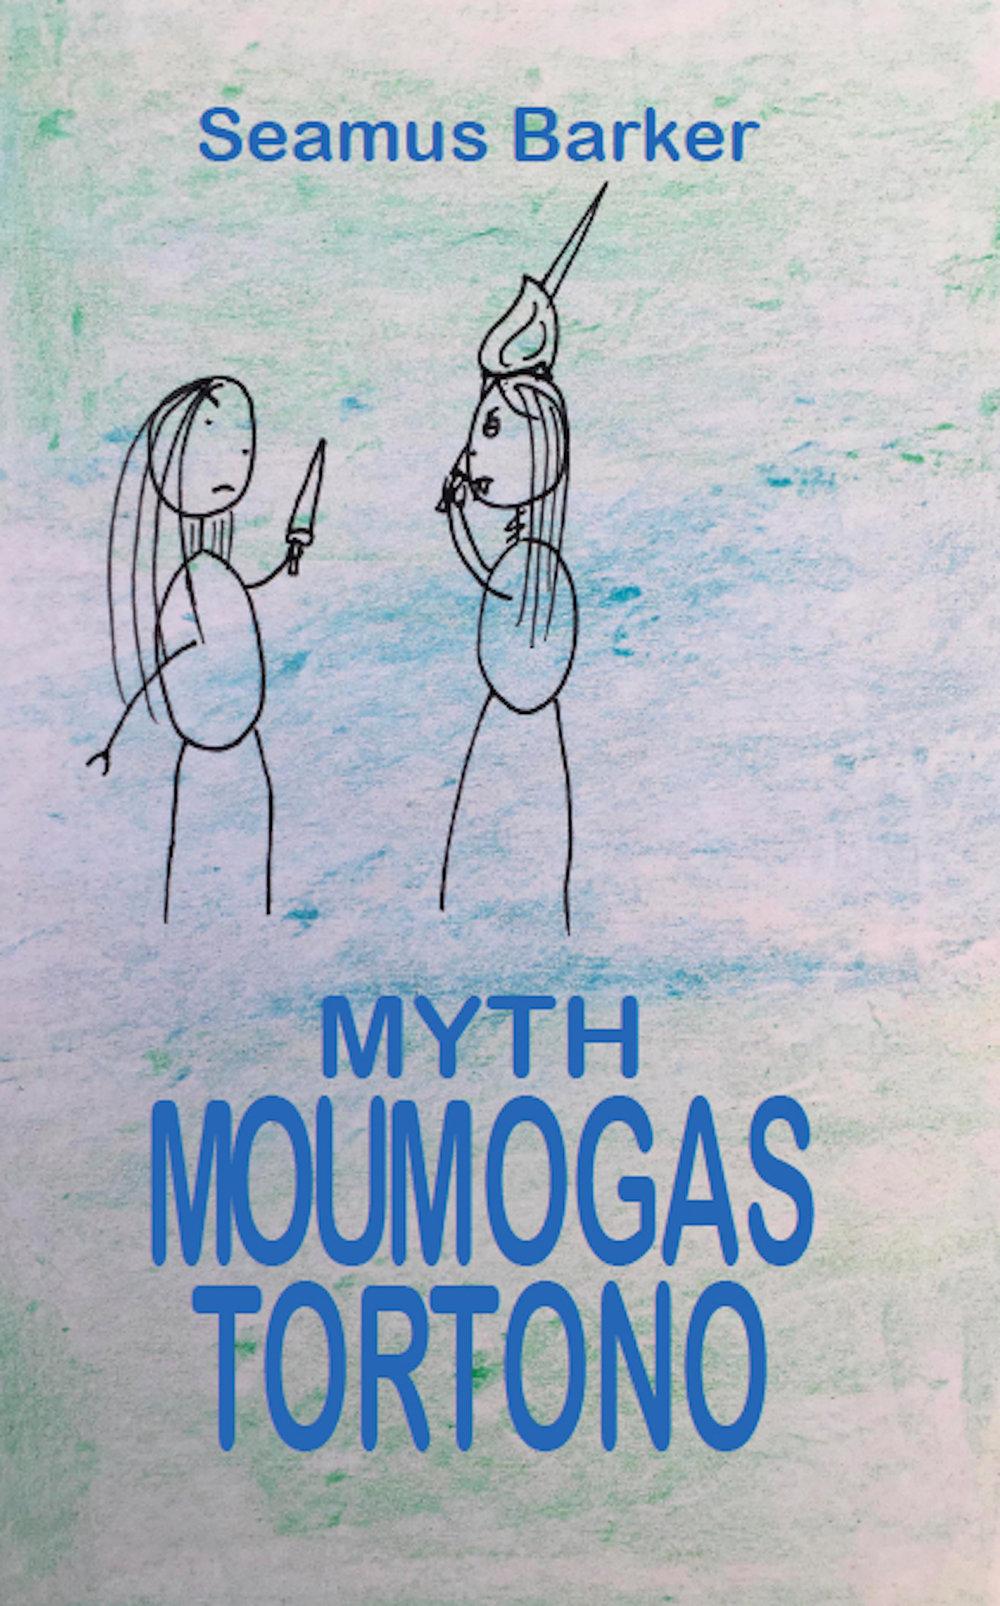 MYTH ebook cover_new.jpg